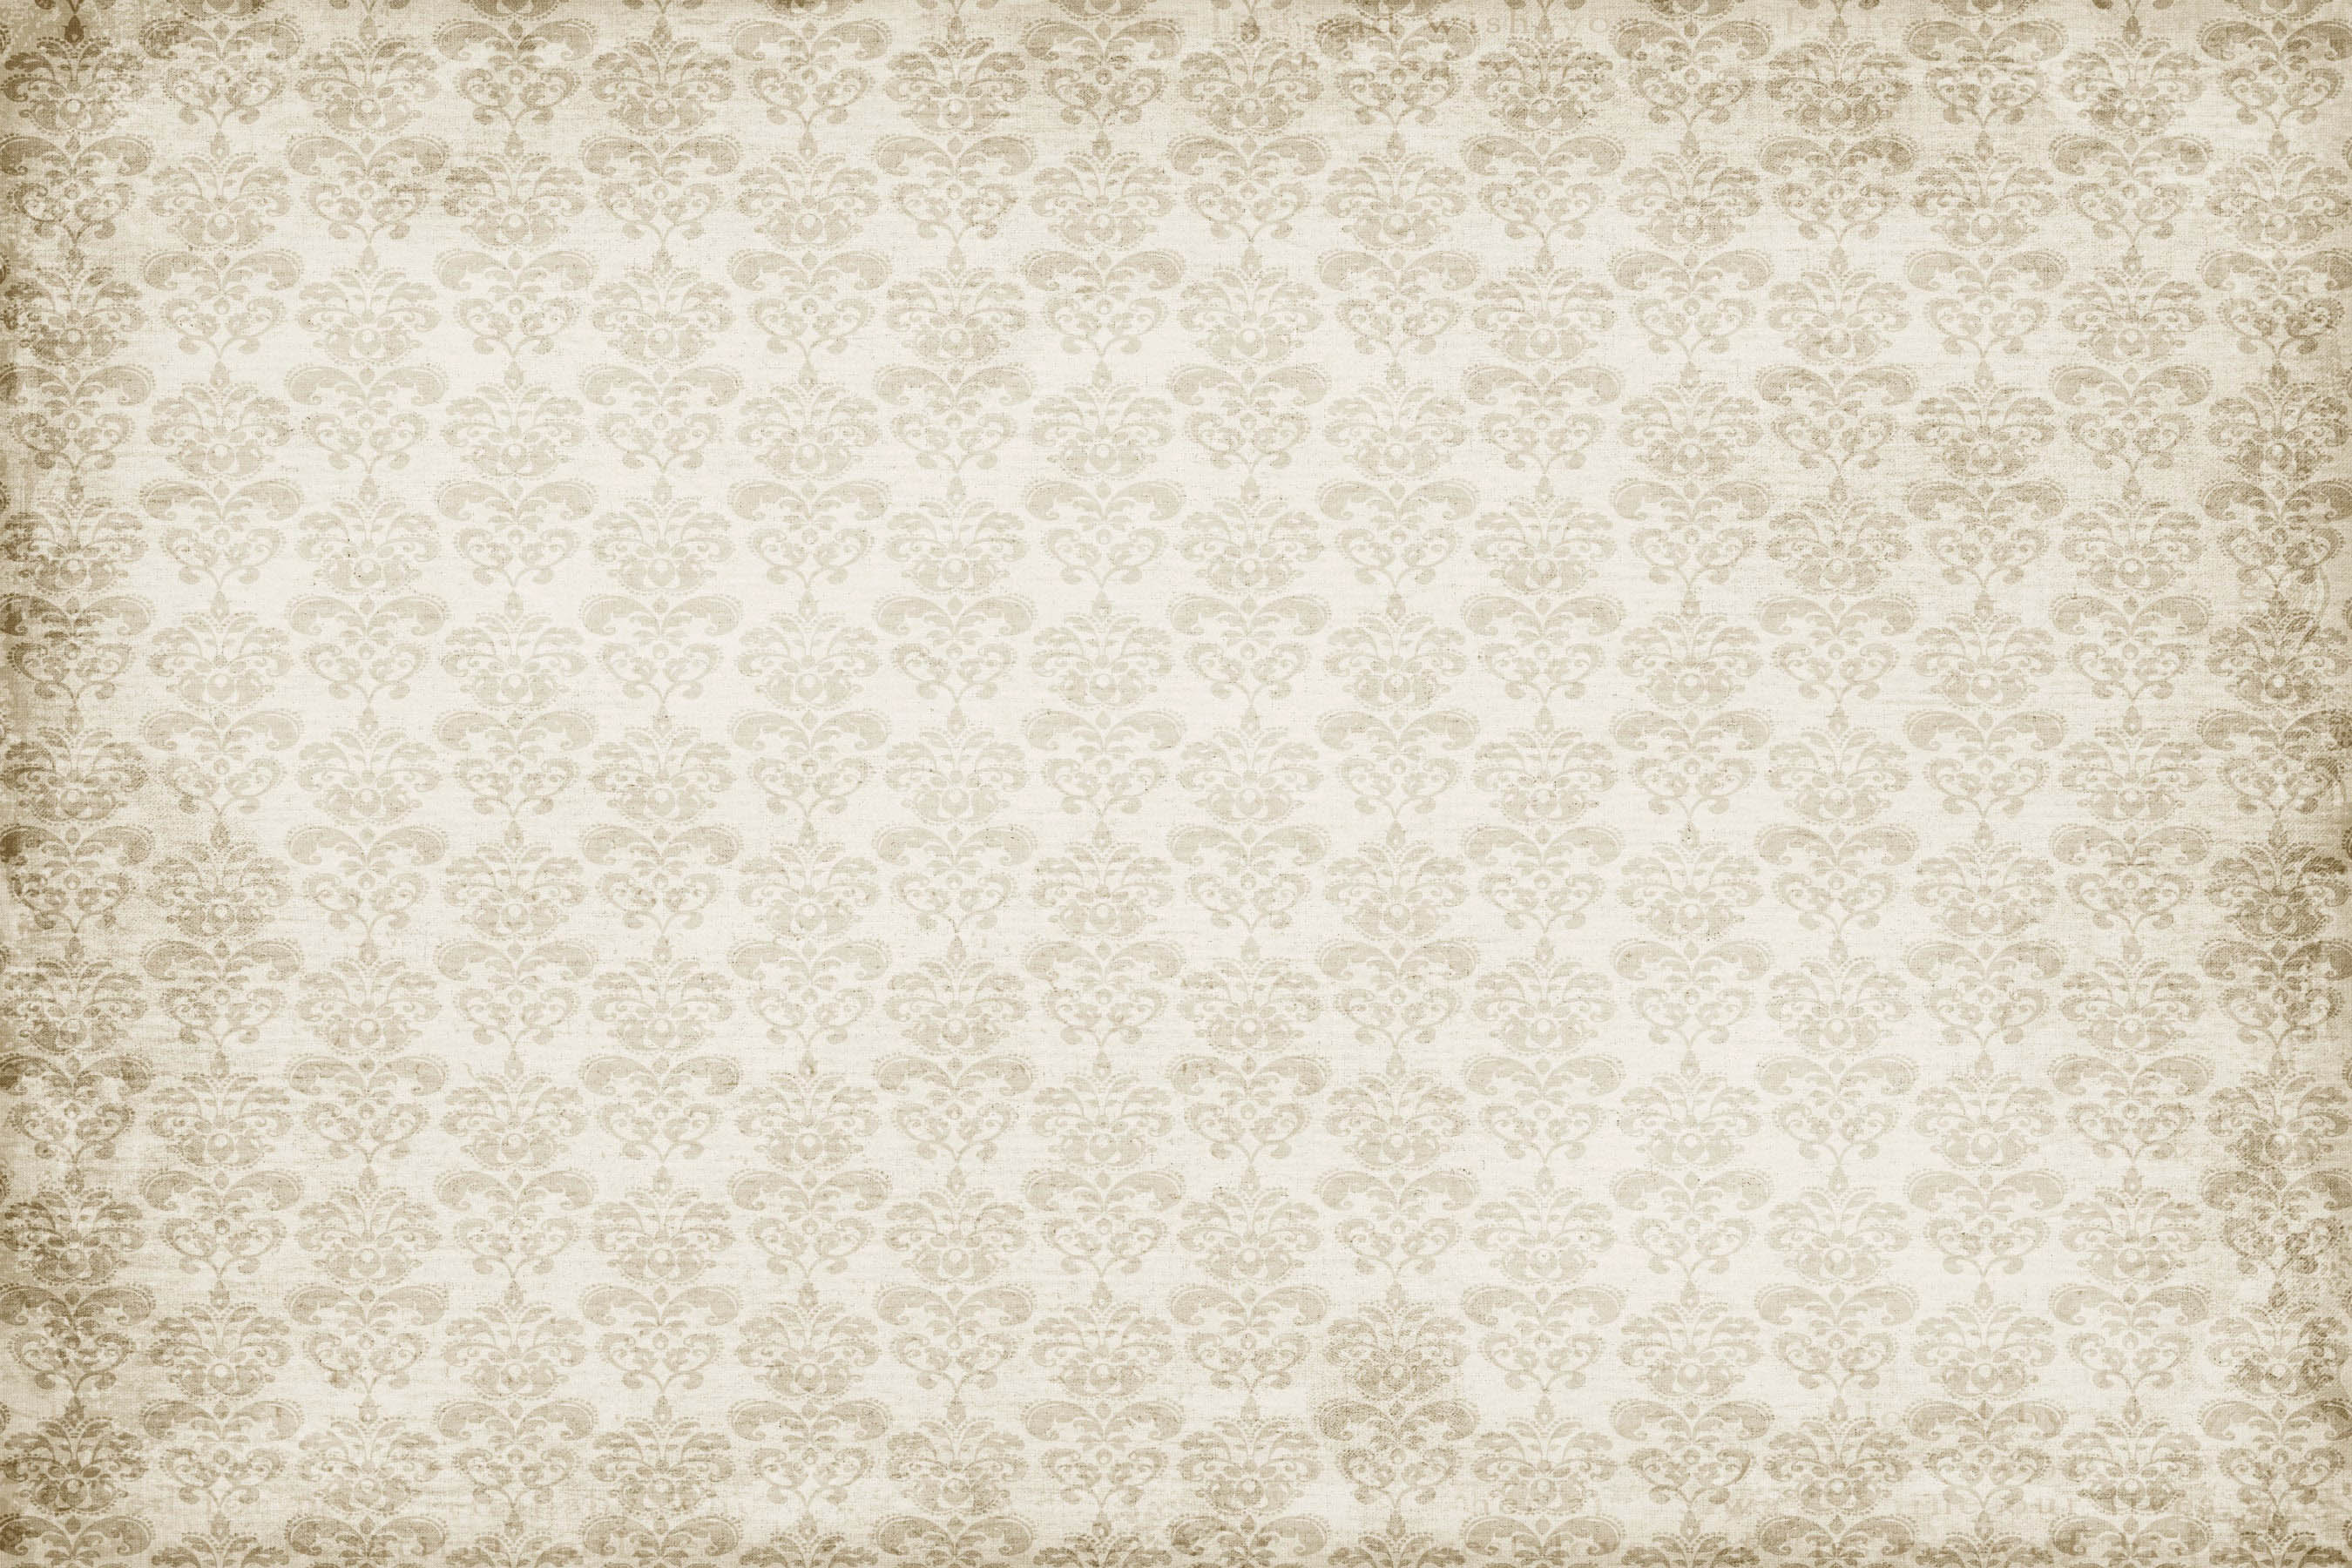 Beige Backgrounds 6 2700x1800